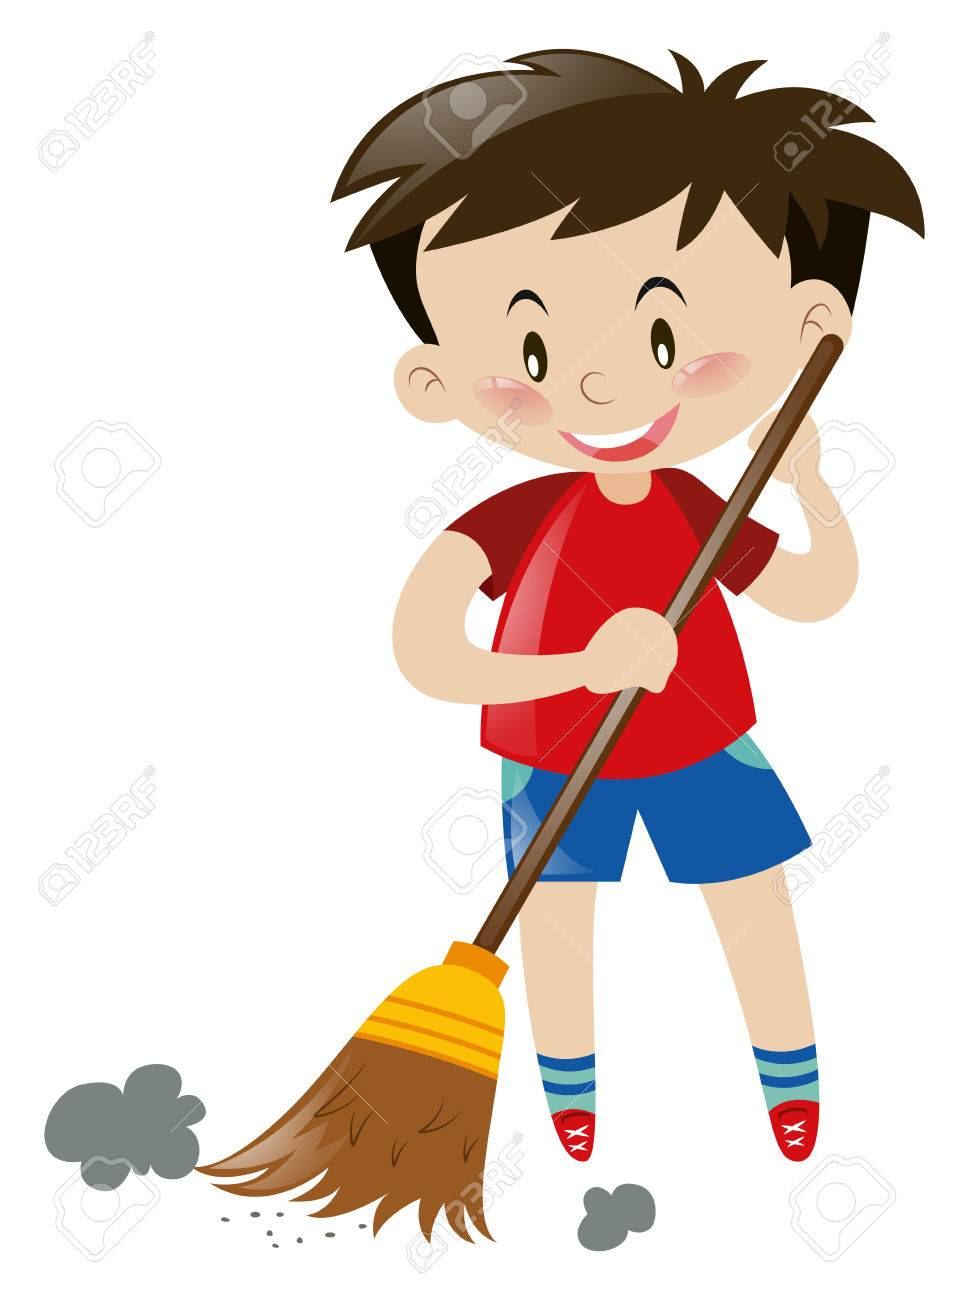 Boy sweeping floor with broom illustration.